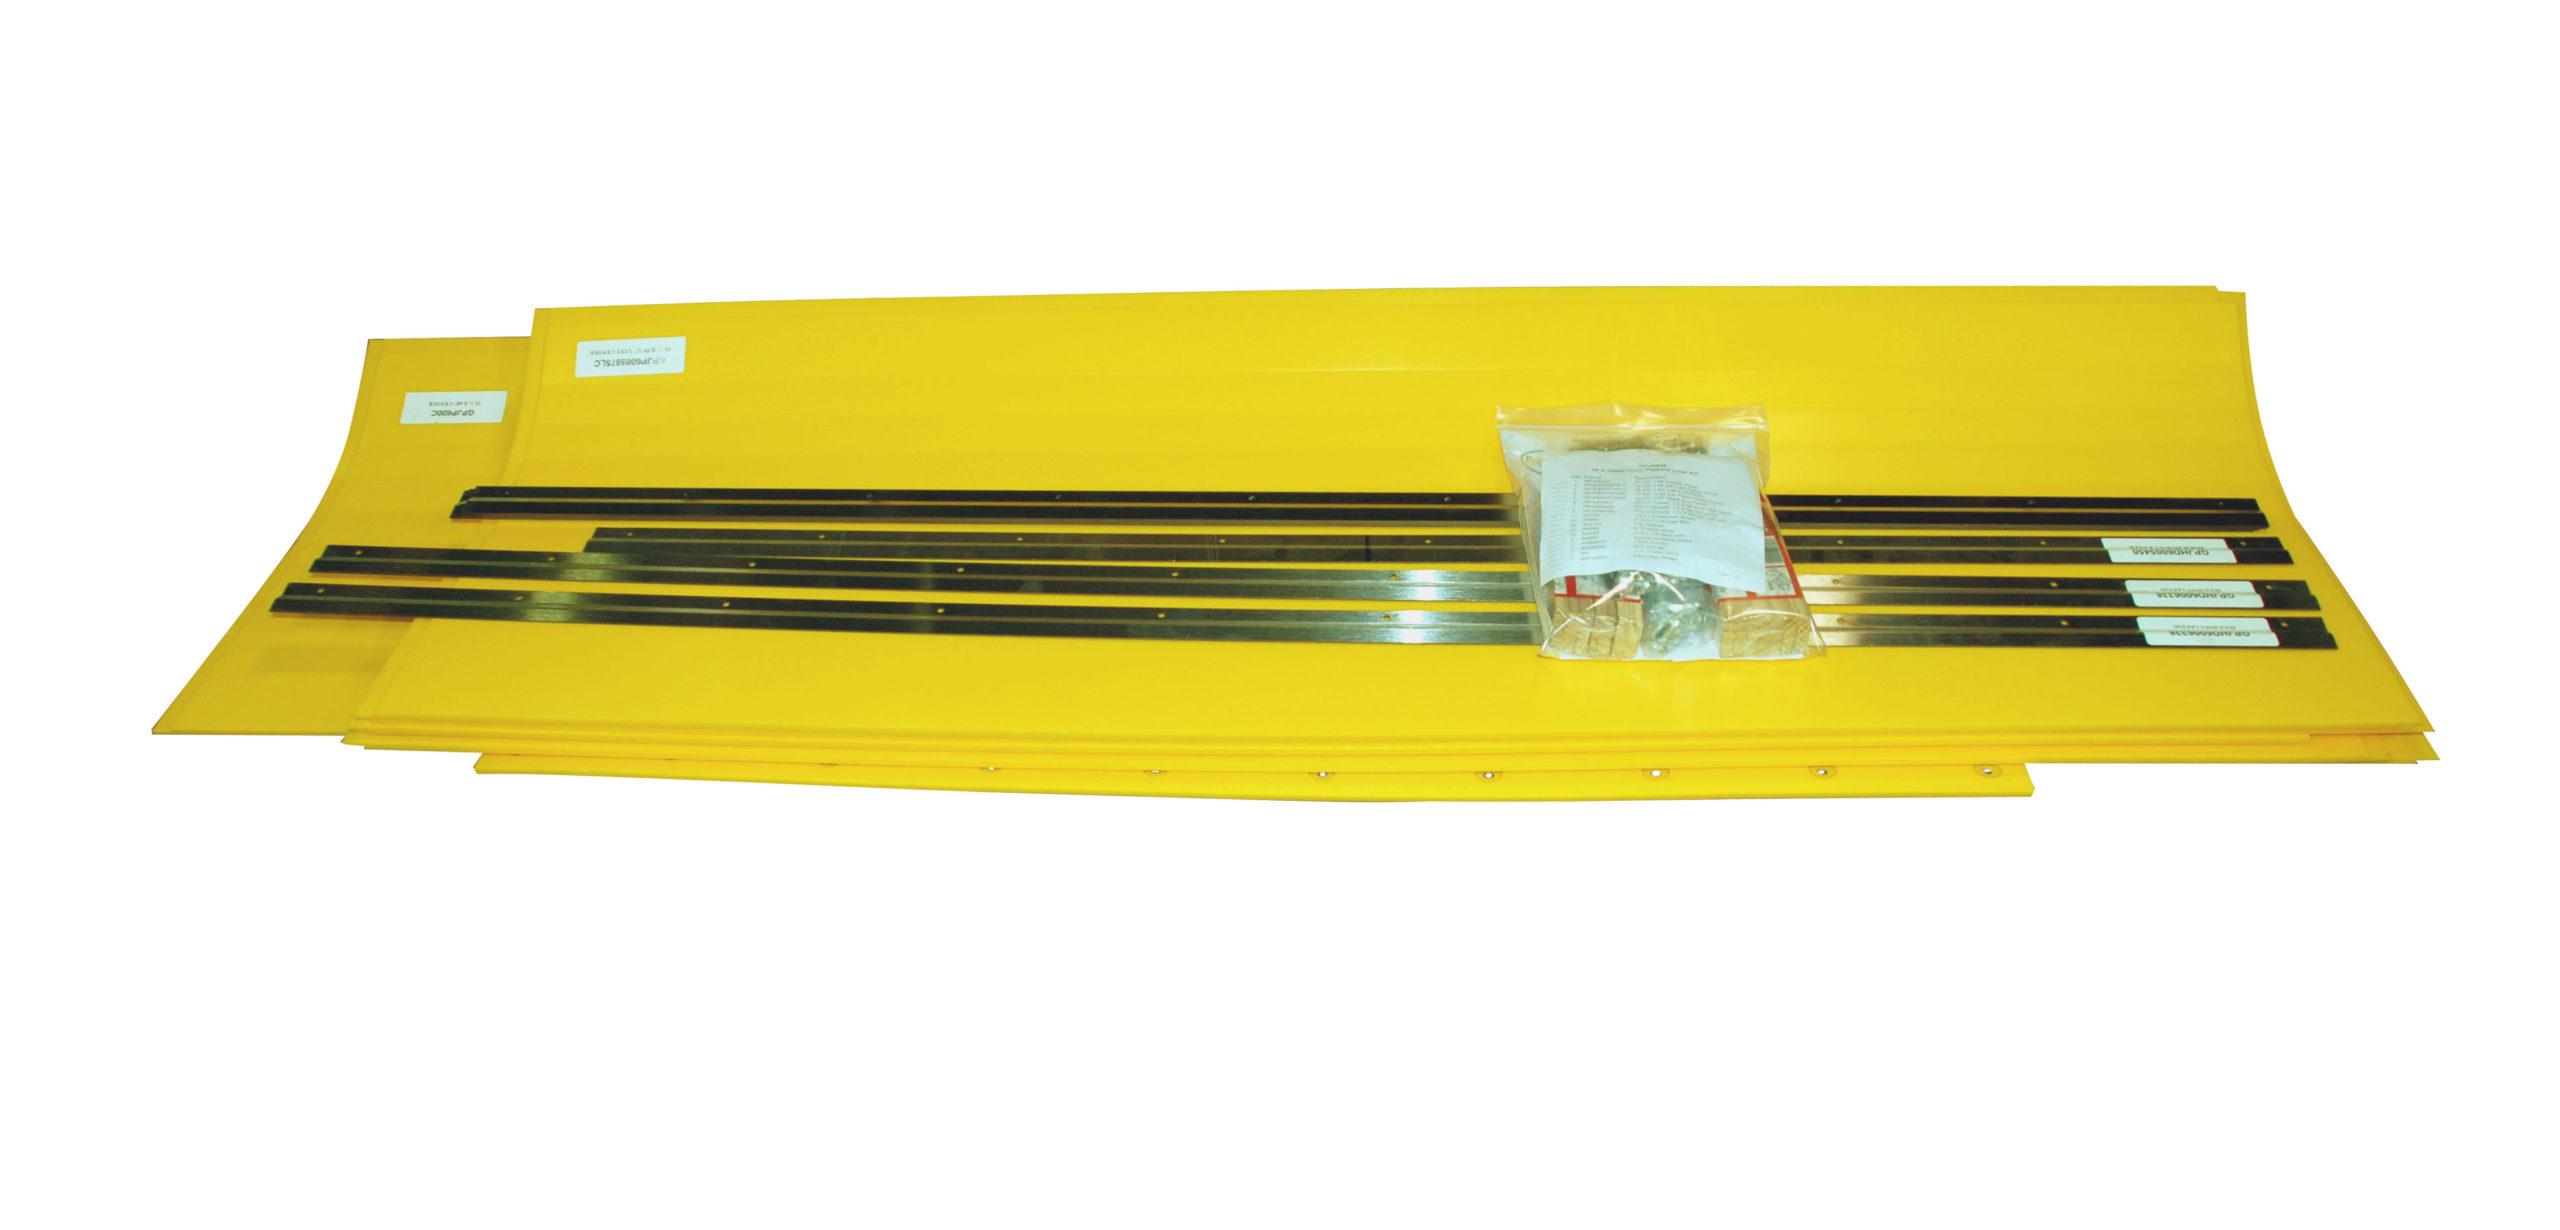 John Deere 600 Series 35' Flex Poly Grain Platform Liner